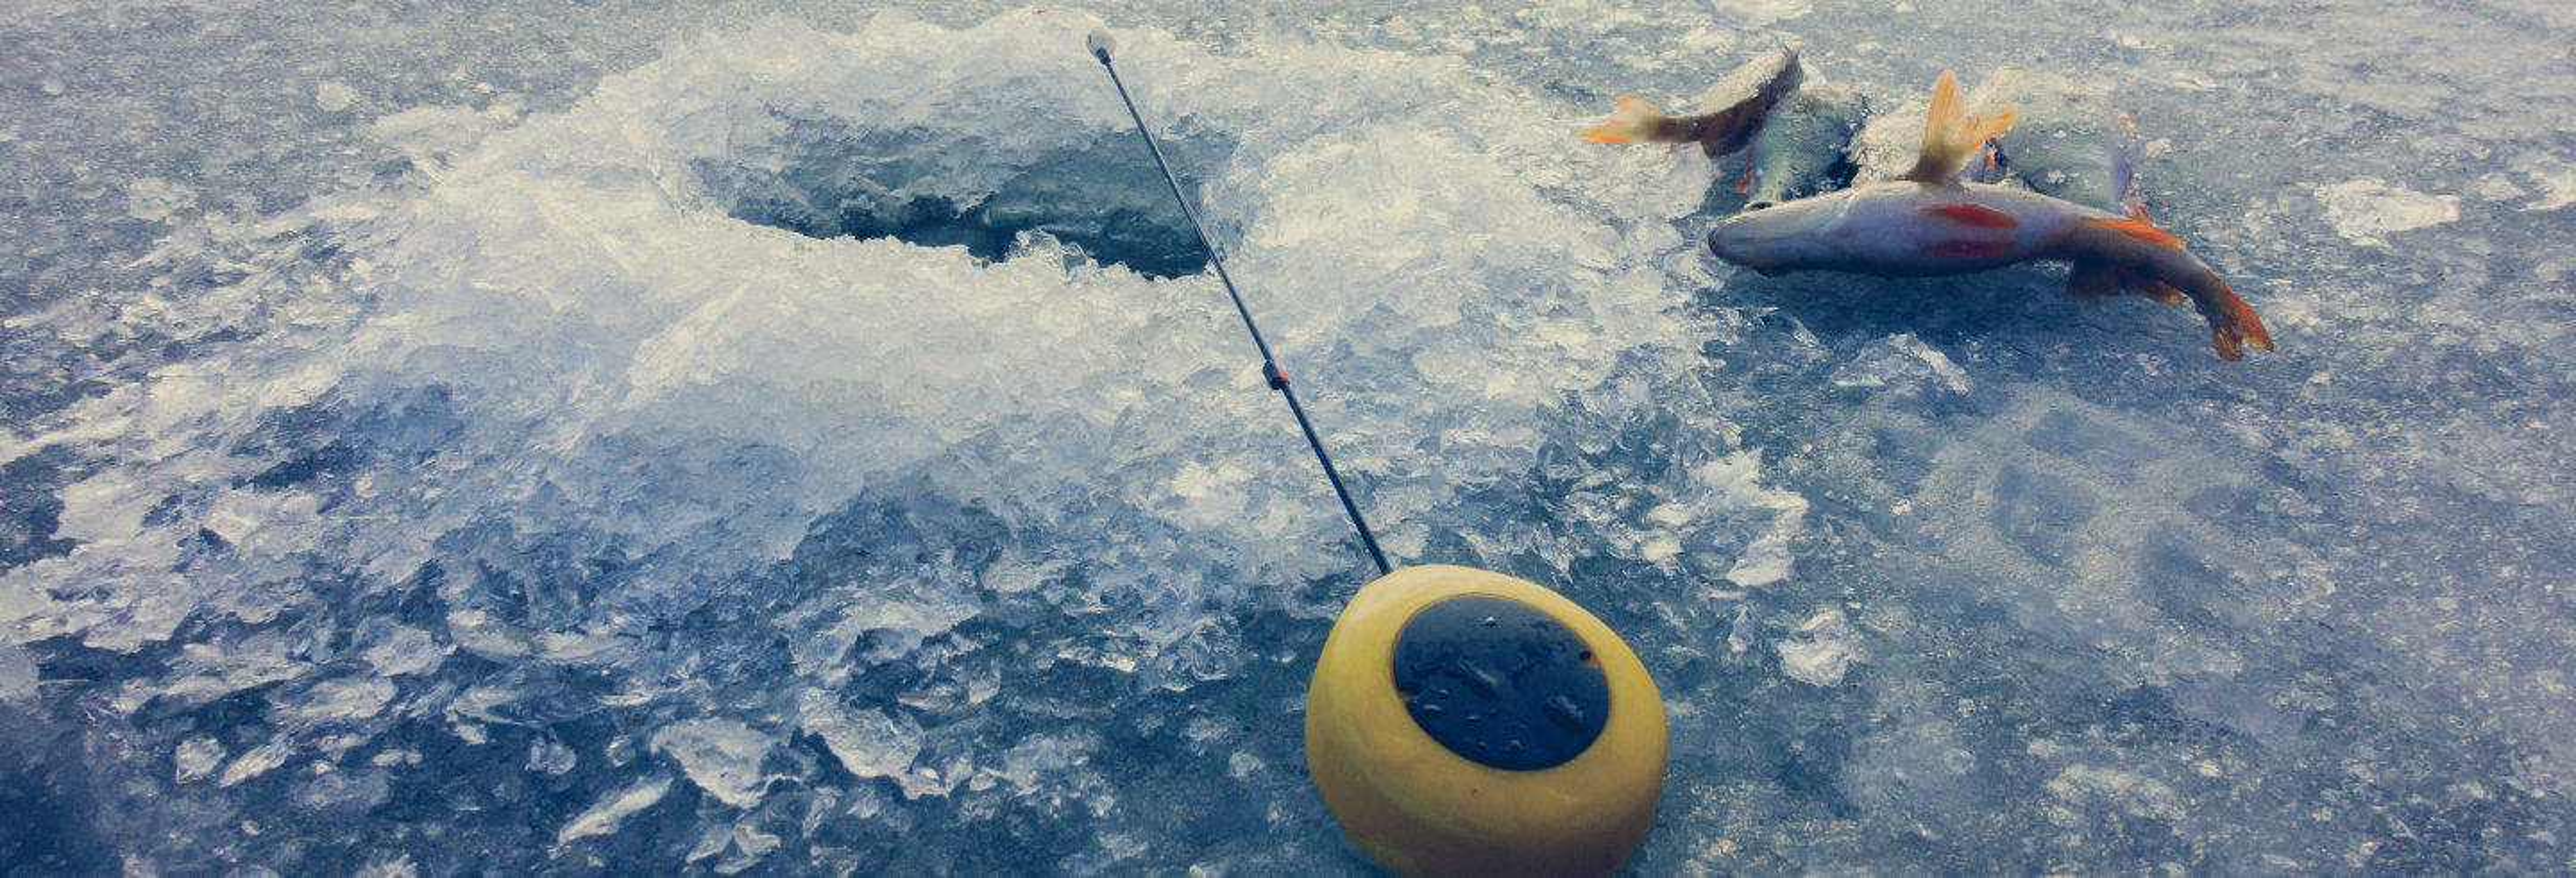 Showshoeing & Ice Fishing